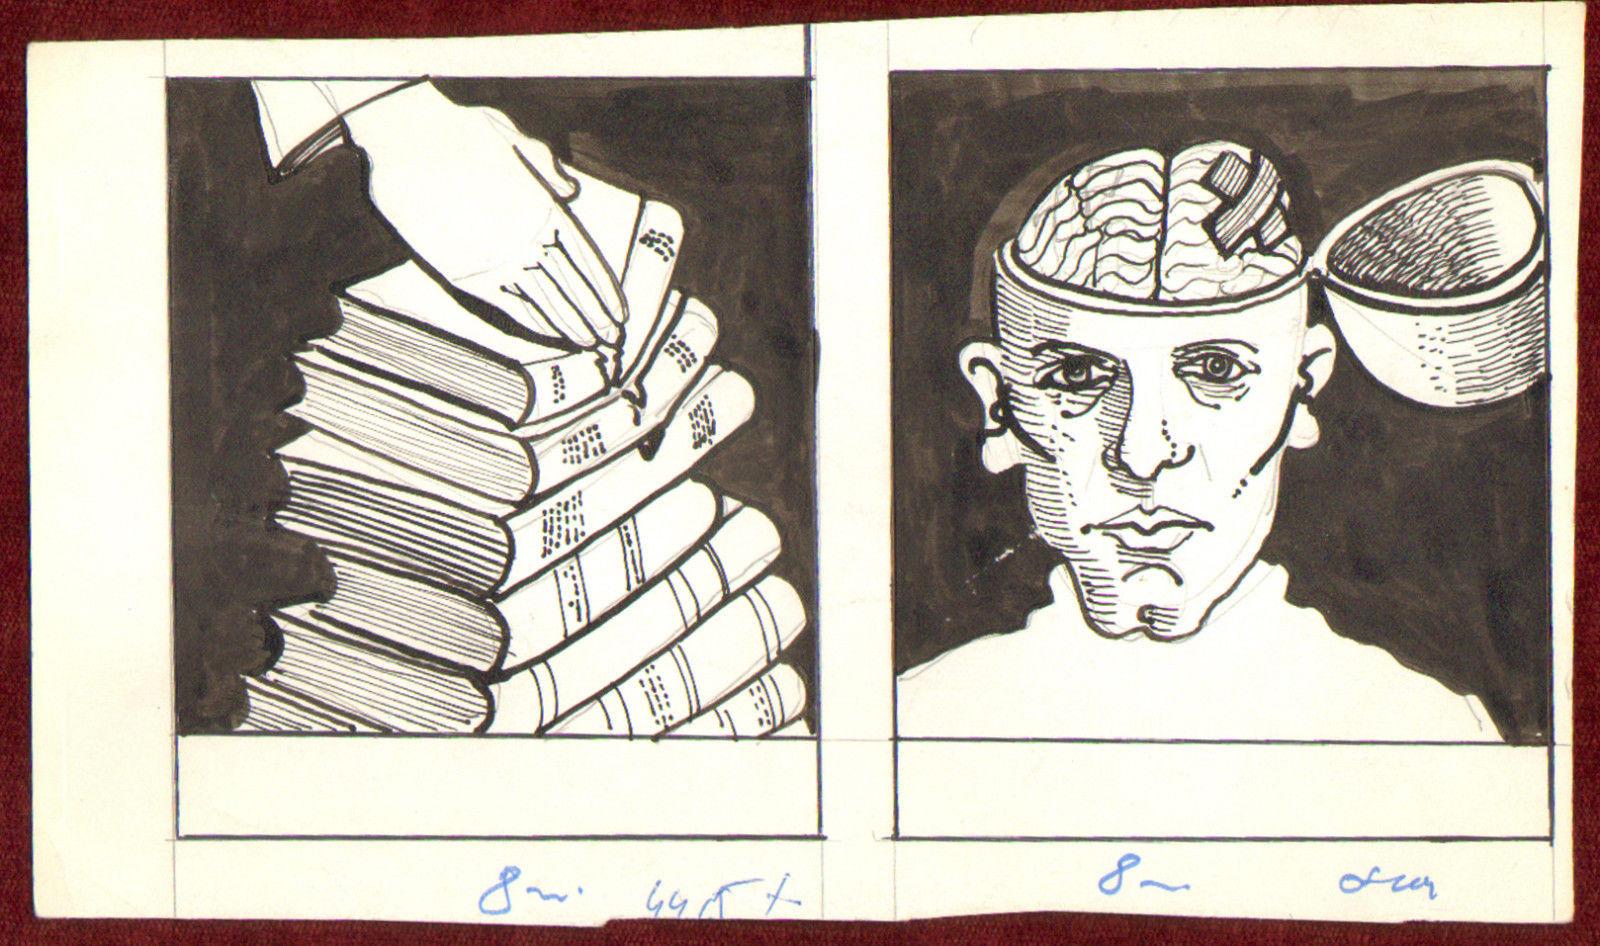 Censorship. Credit: Postcard drawing by an unidentified Yugoslav artist.